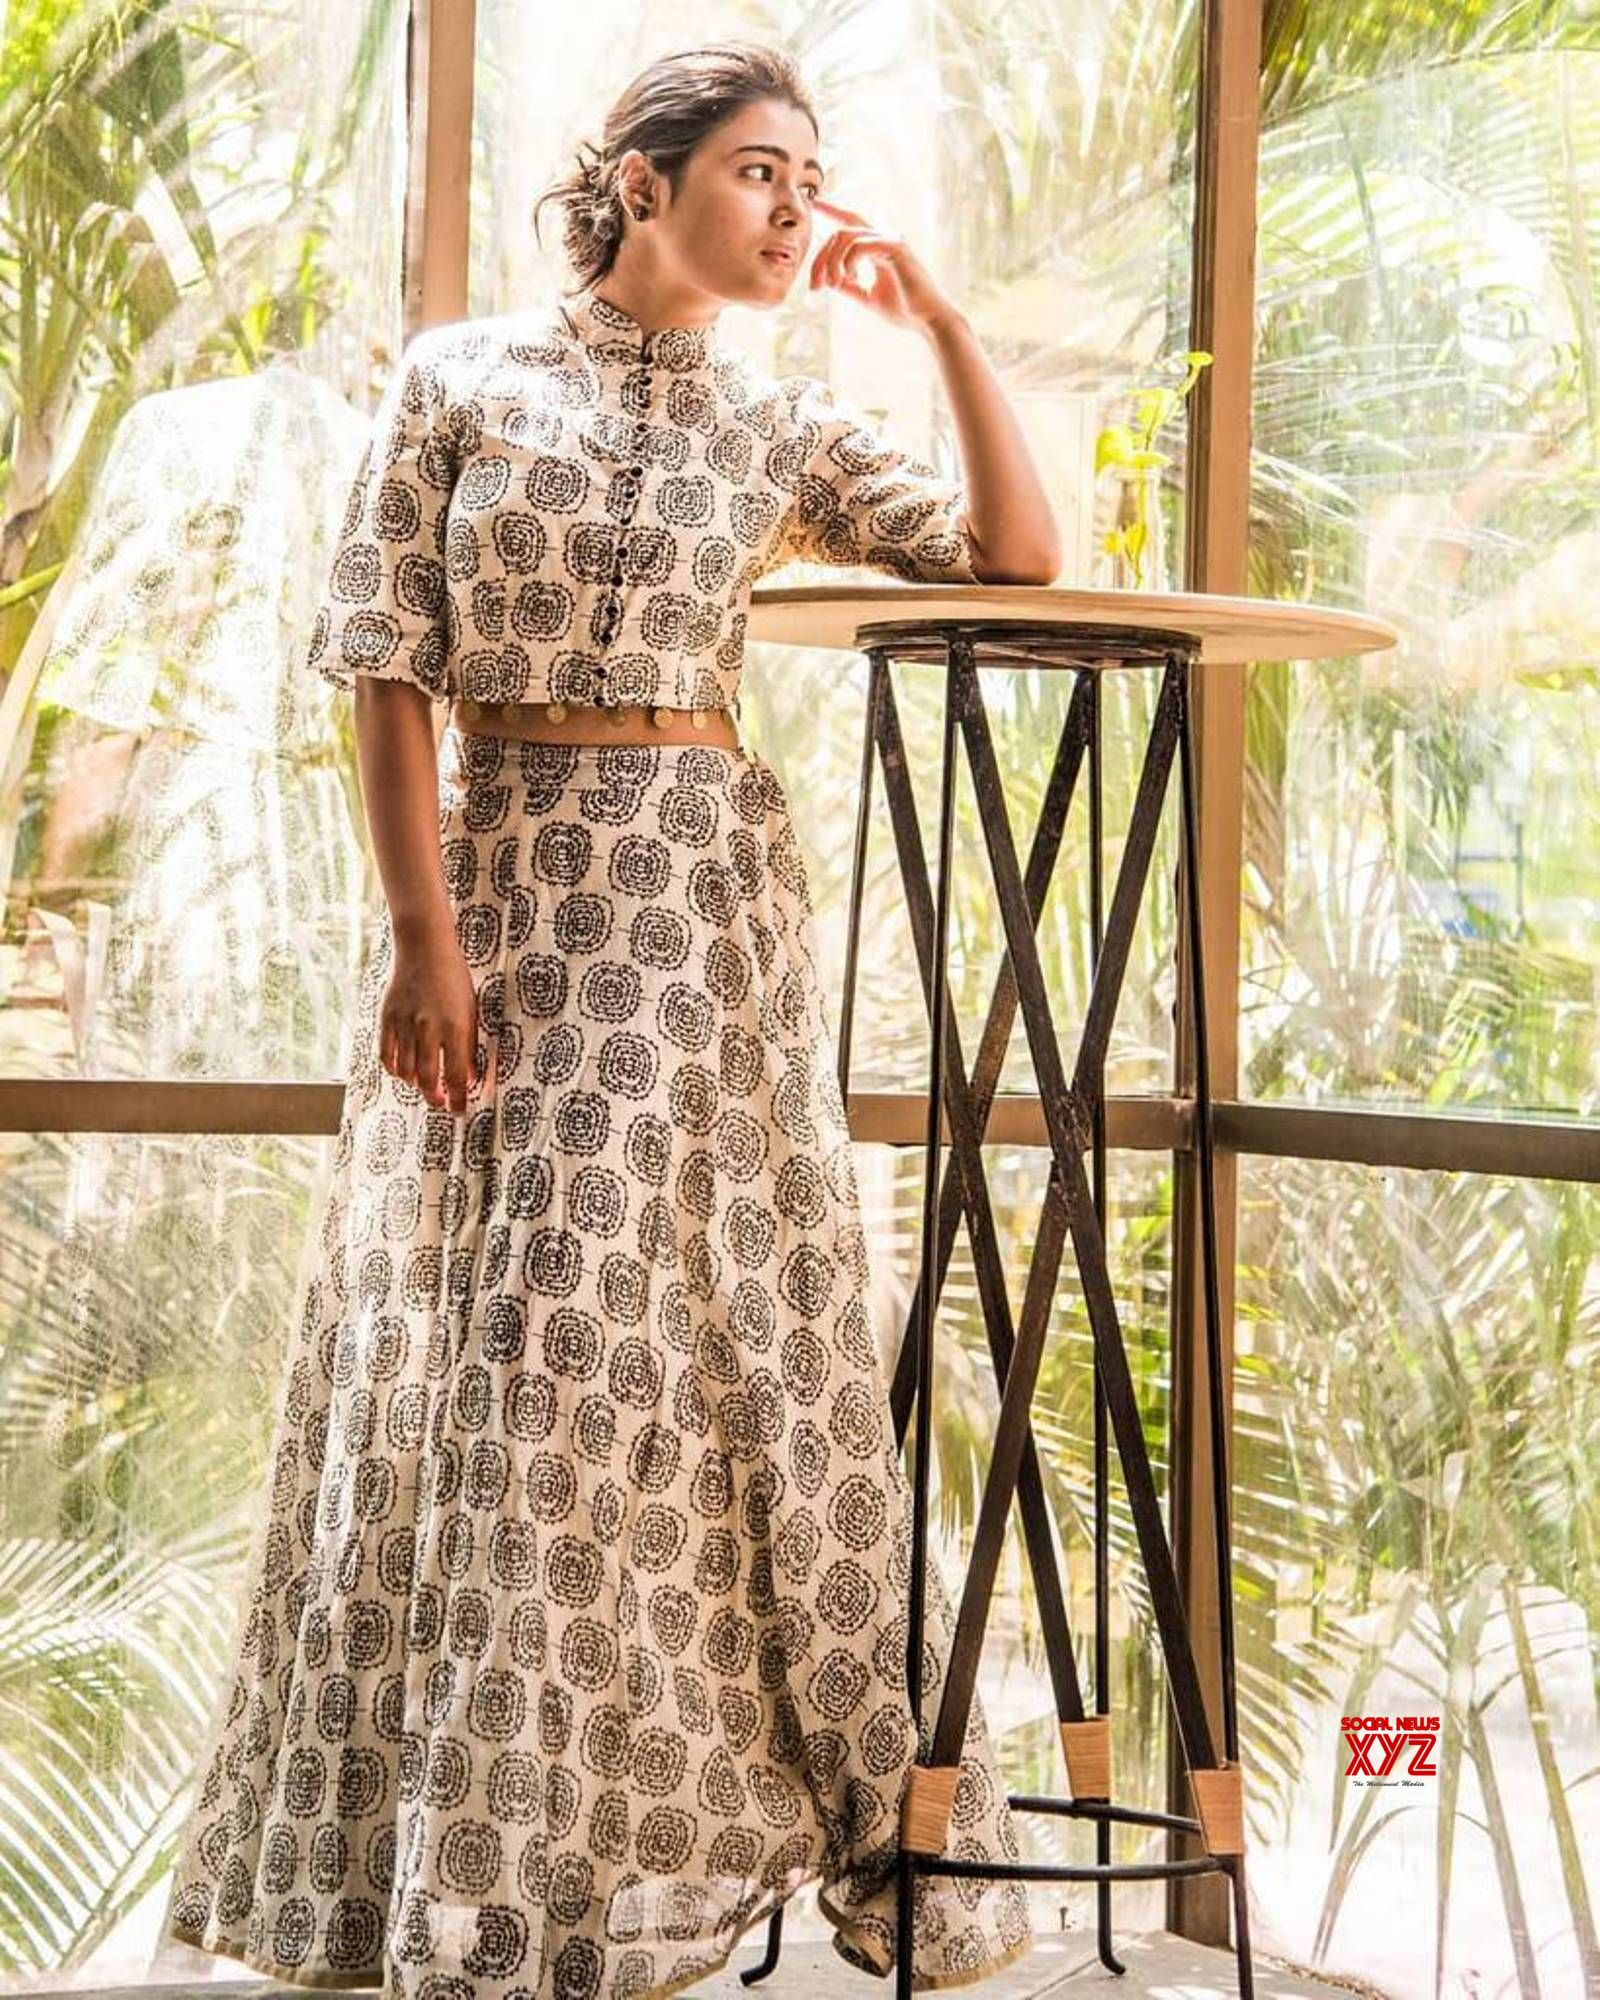 Madhu Shalini Hot Sex Good actress shalini pandey hot new stills - social news xyz